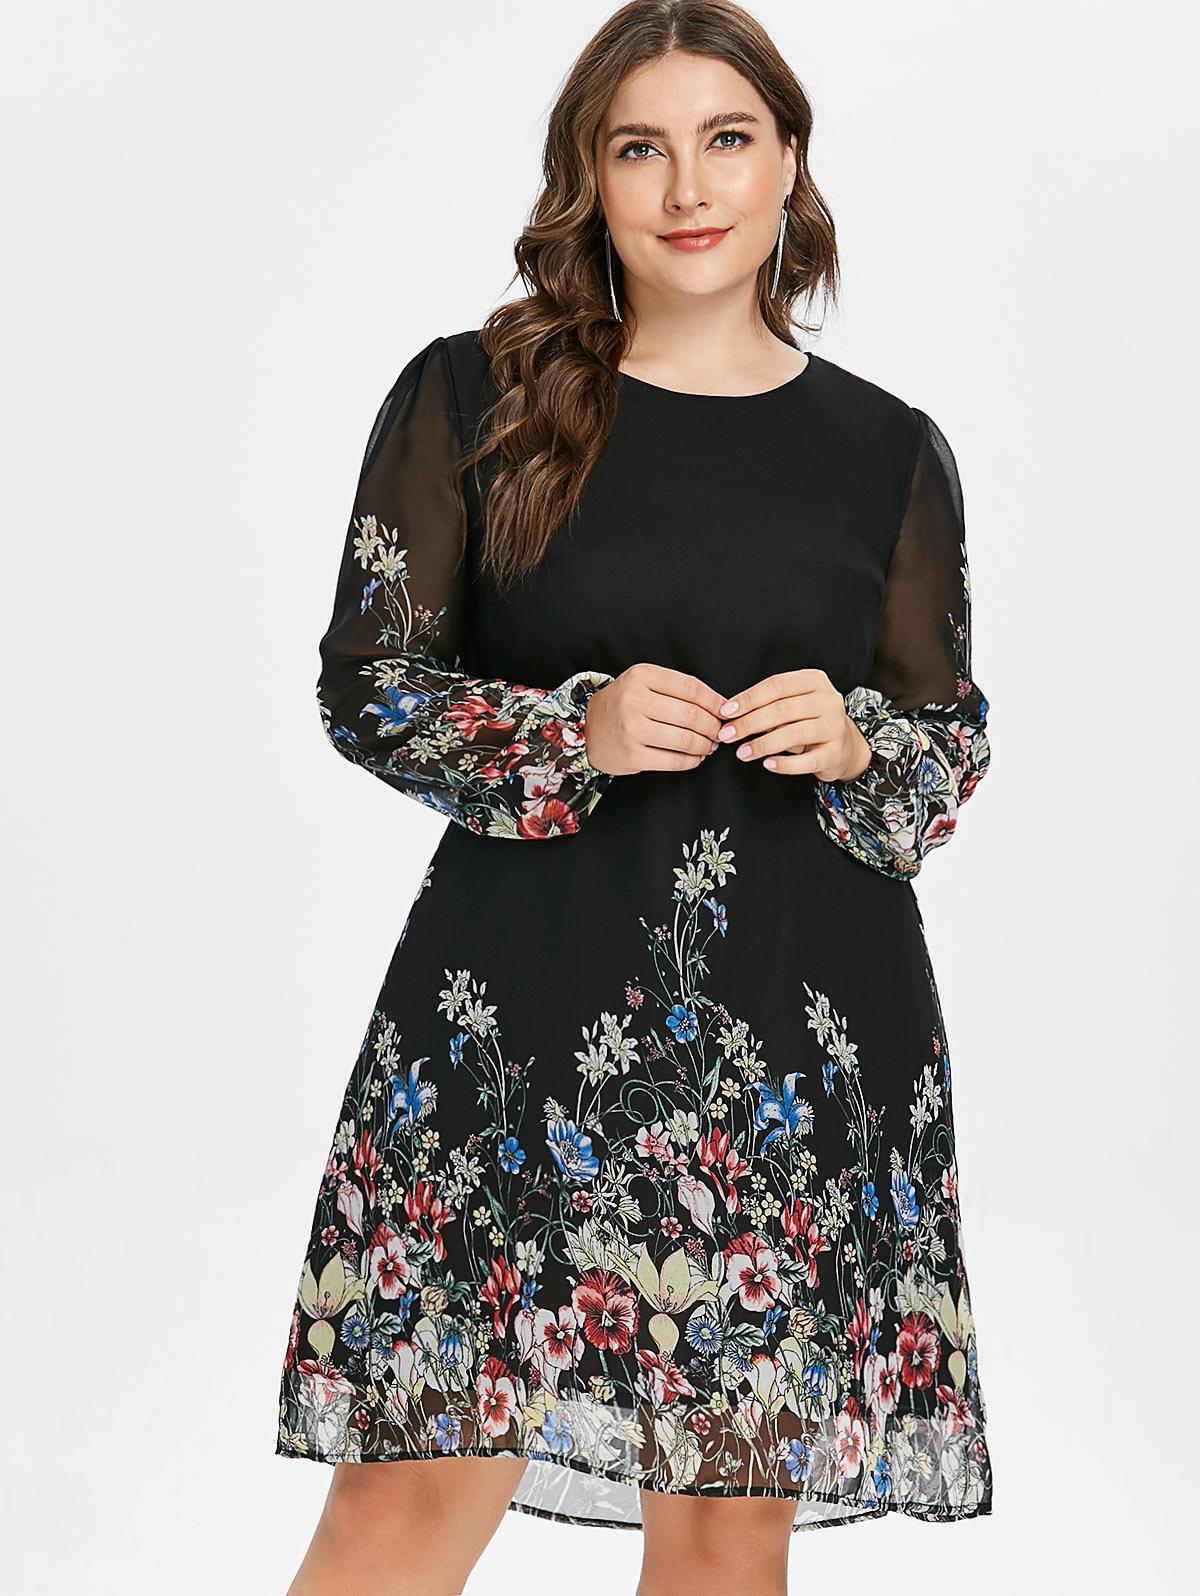 Plus Size Floral Print Tunic Women Dress Long Sleeve Autumn Elegant Tribal  Flower Print Vocation Shirt Dress Chiffon 5xl